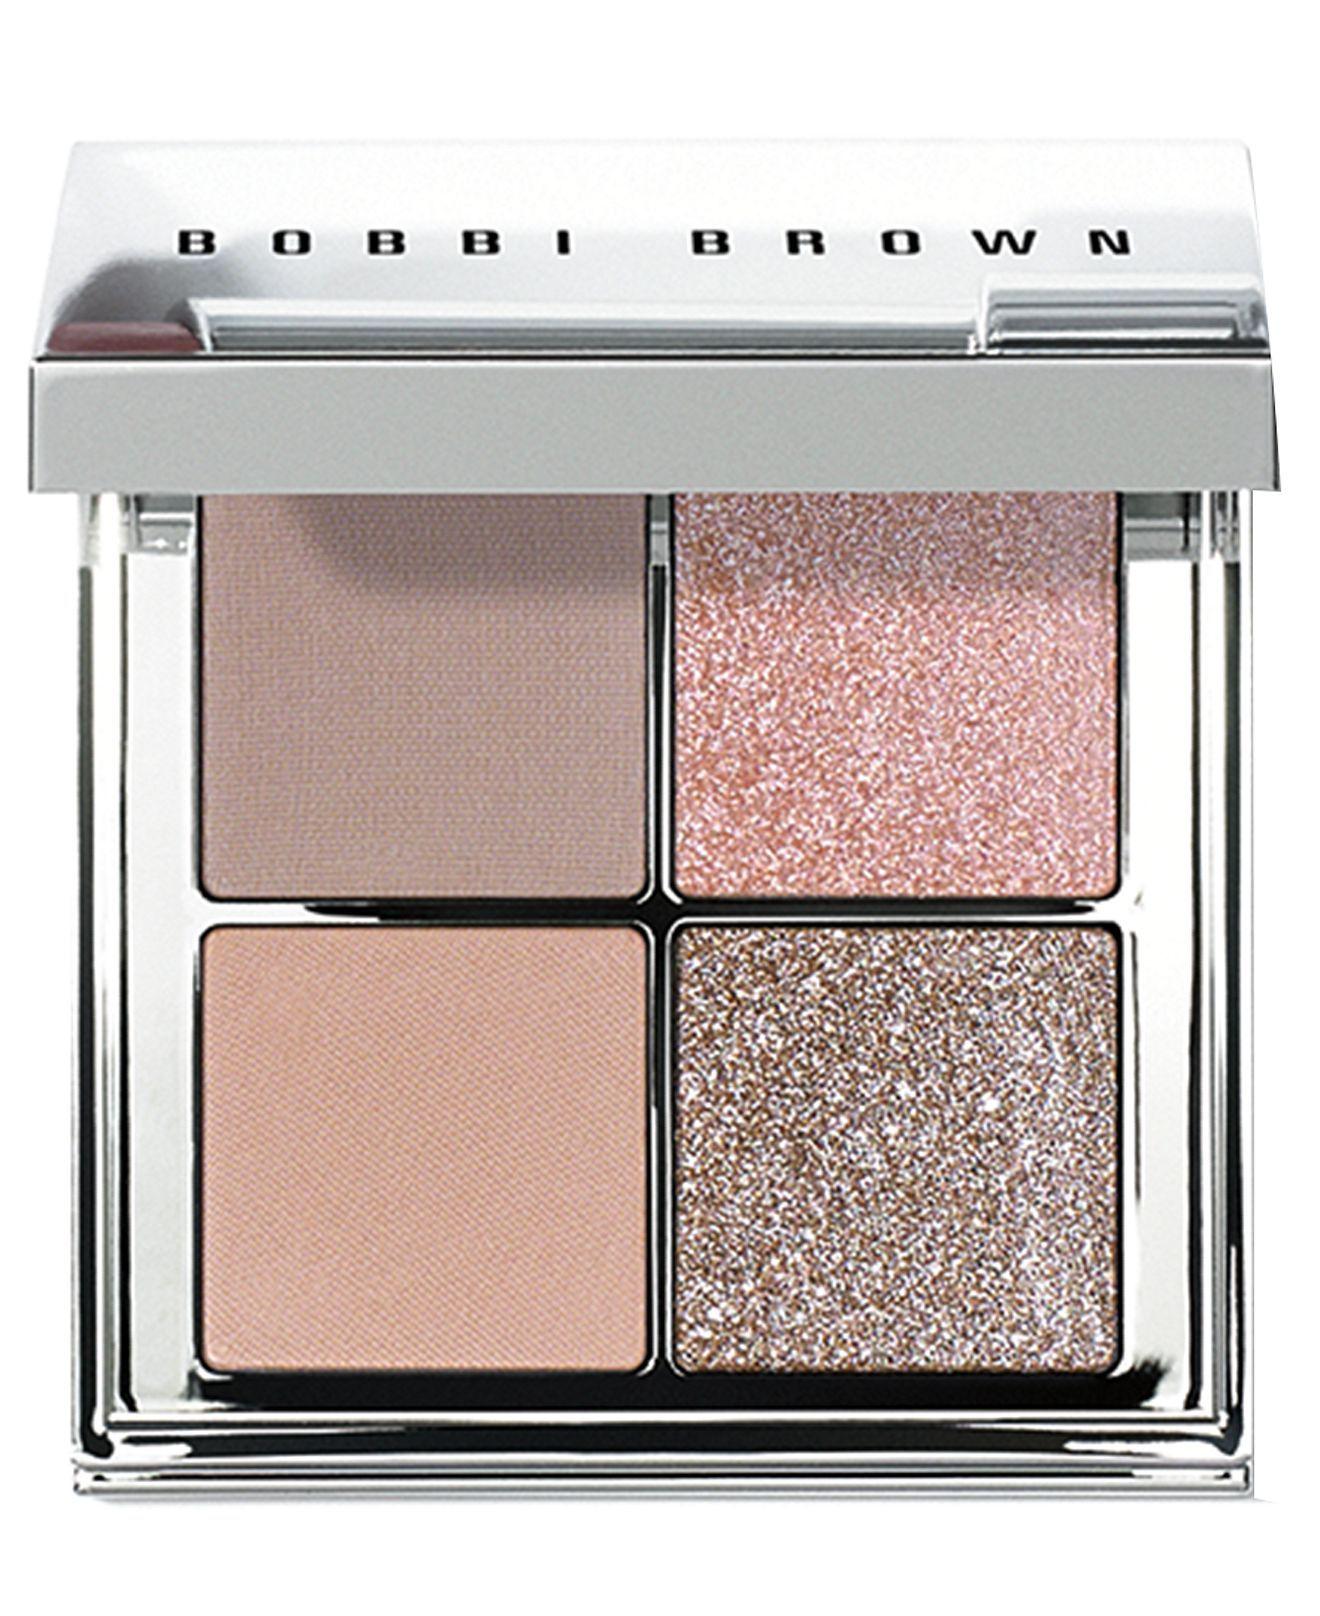 Bobbi Brown Nude Glow Nude Eye Palette - Makeup - Beauty - Macy's